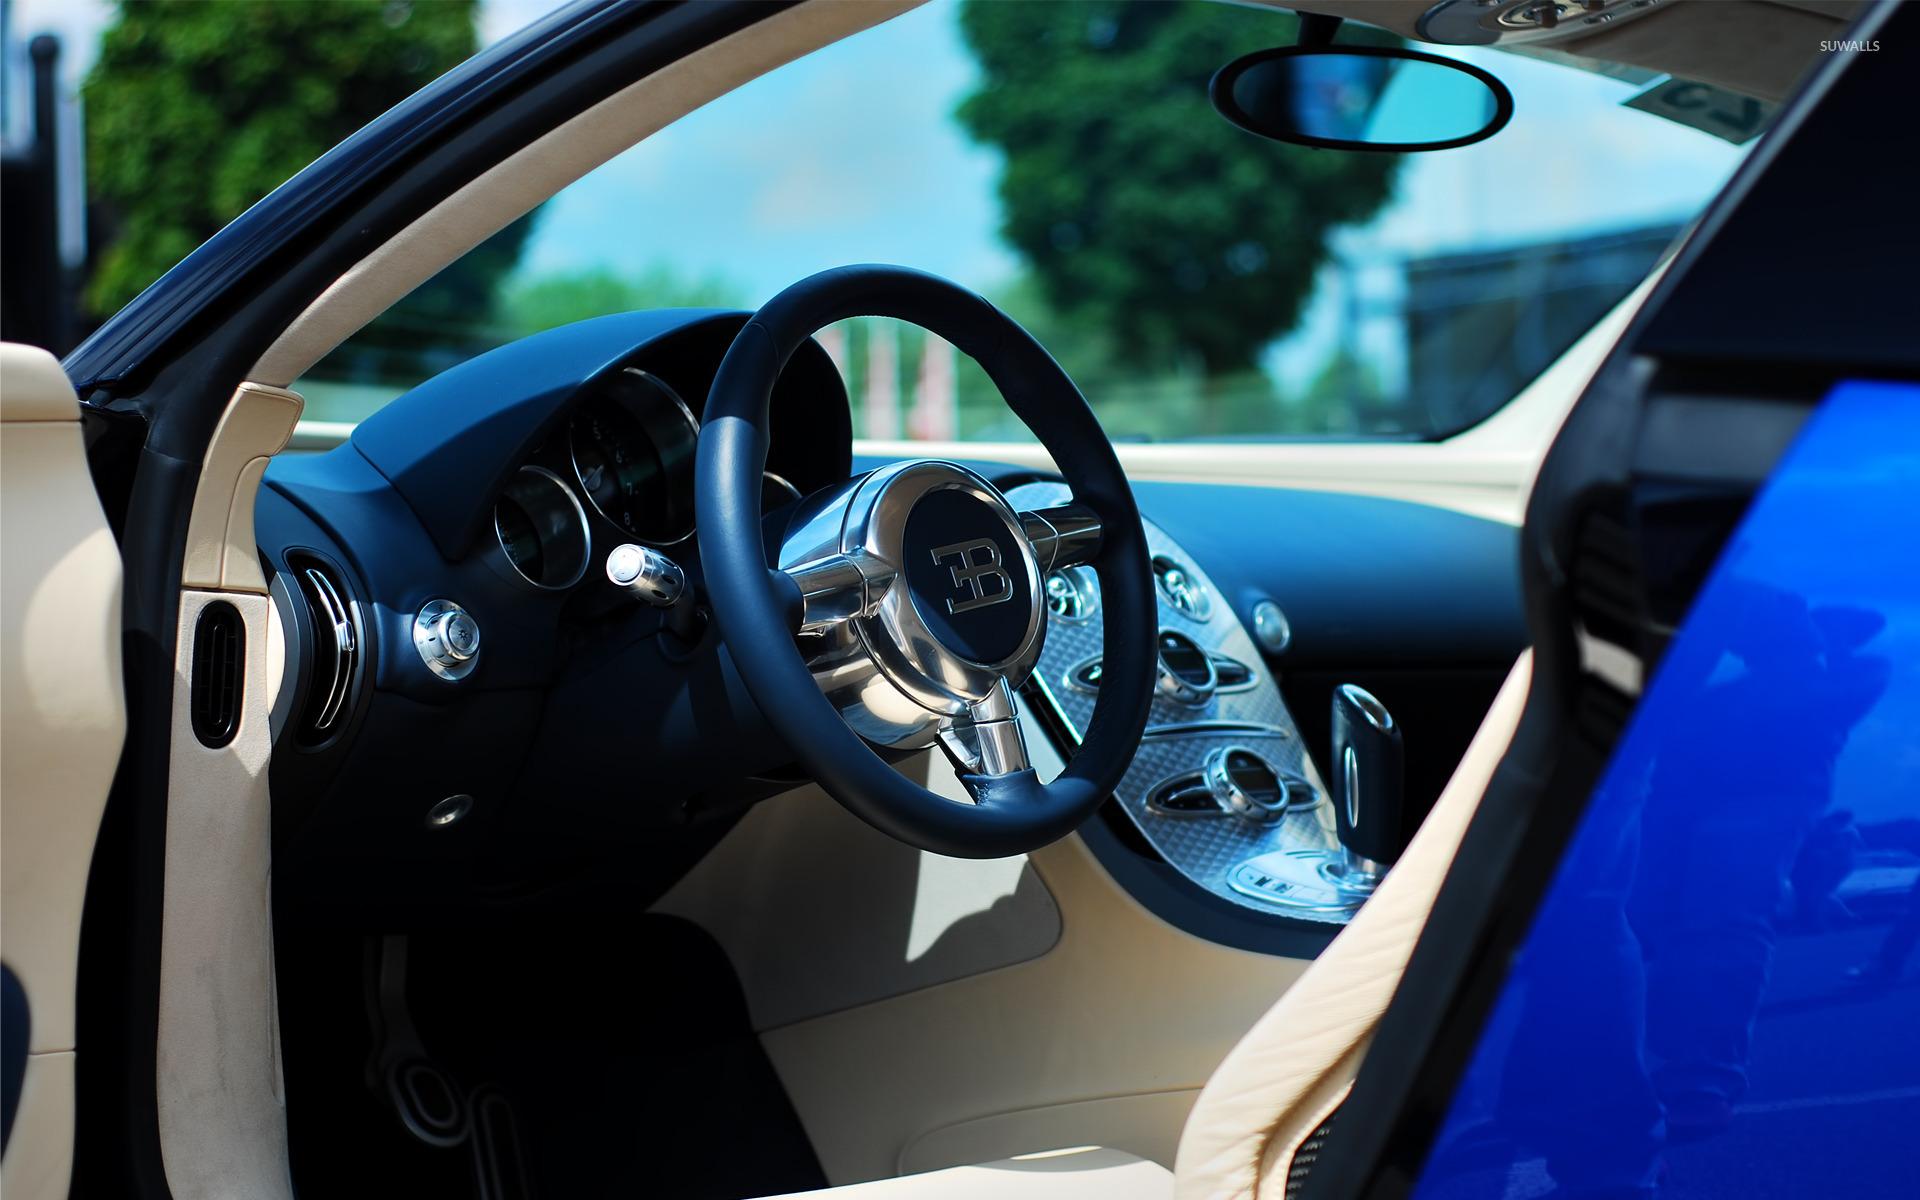 bugatti veyron interior wallpaper car wallpapers 37675. Black Bedroom Furniture Sets. Home Design Ideas